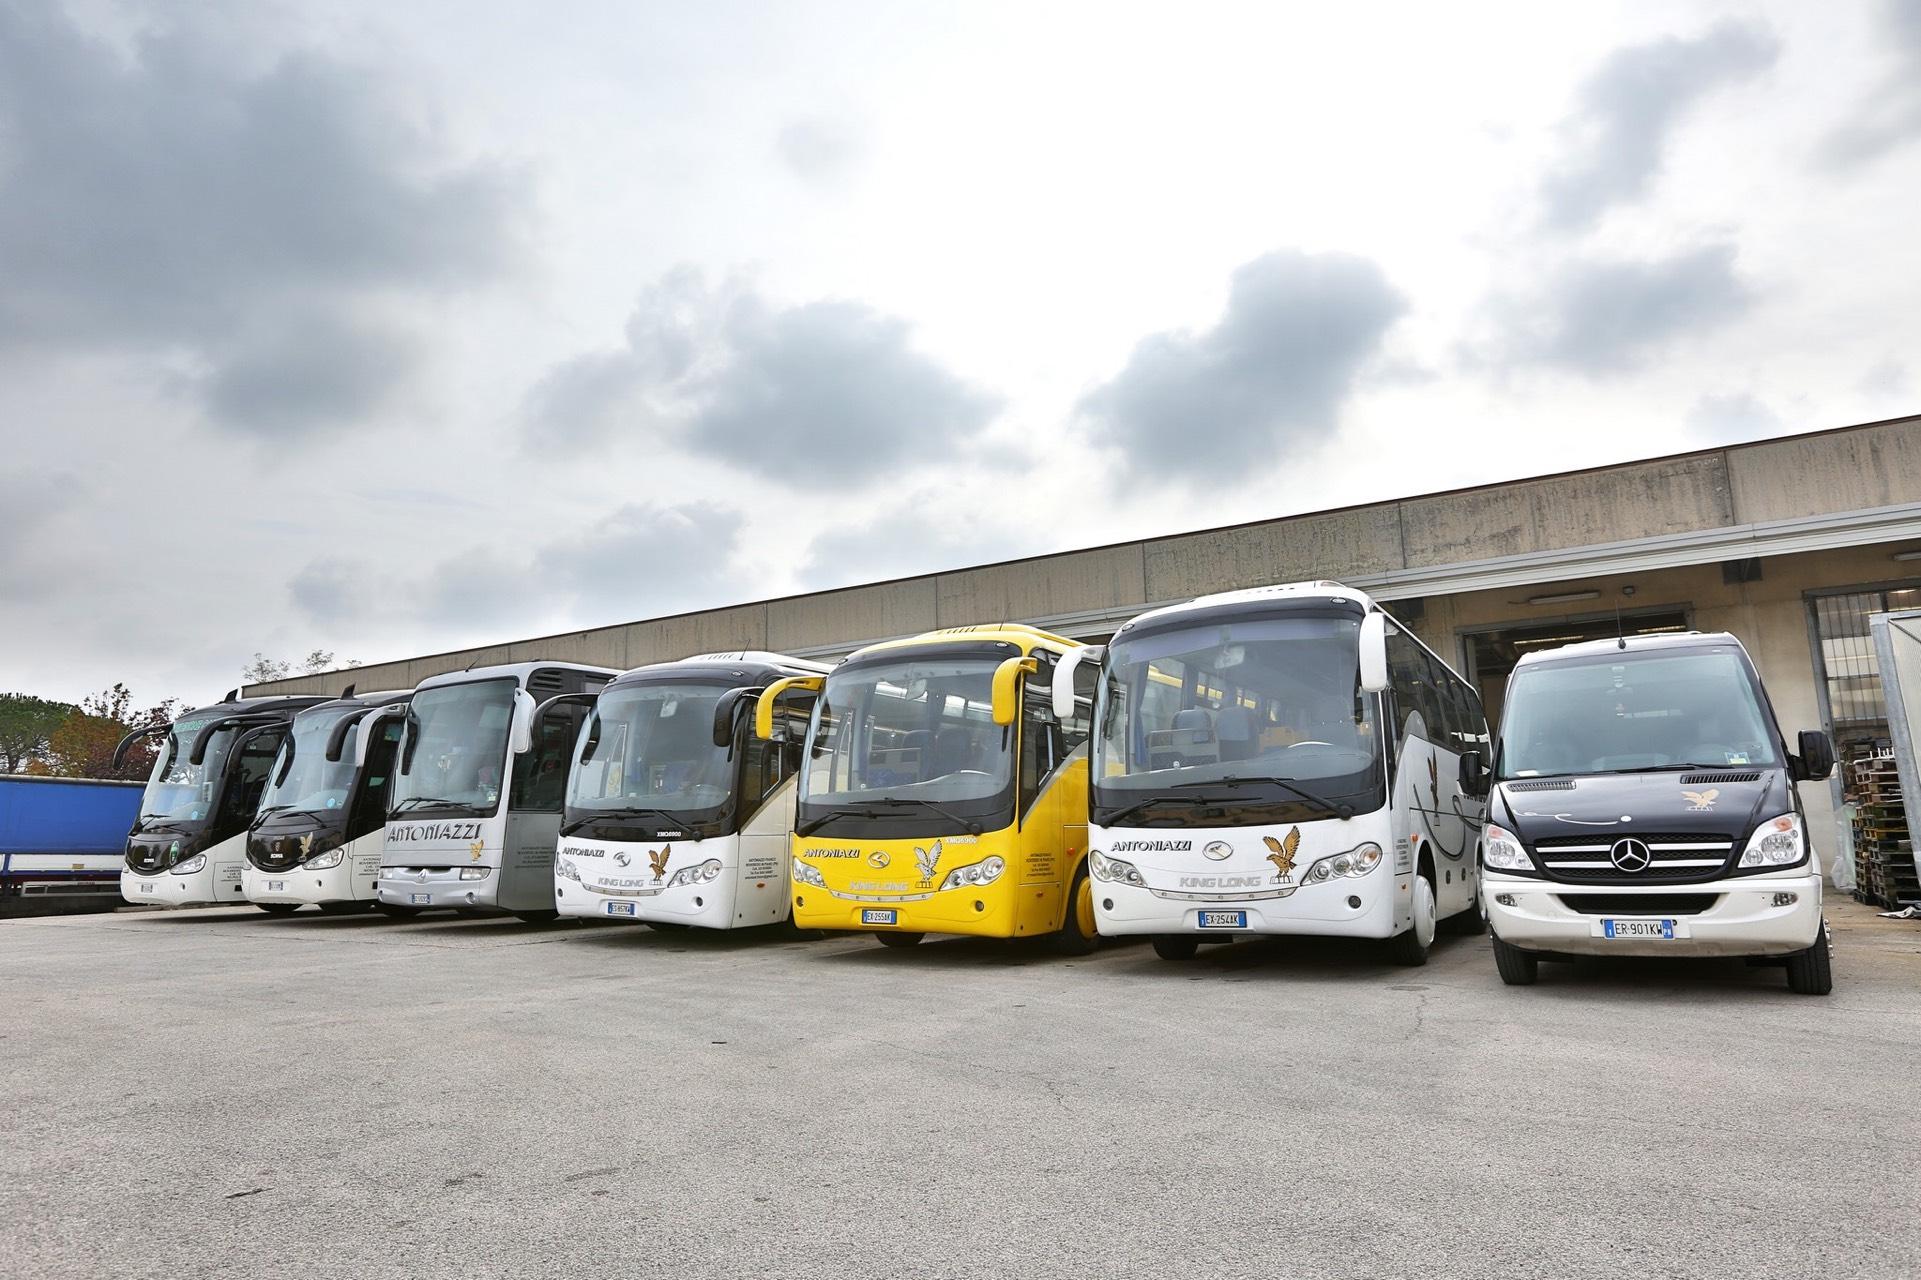 Antoniazzi-autobus-trasporti-pordenone